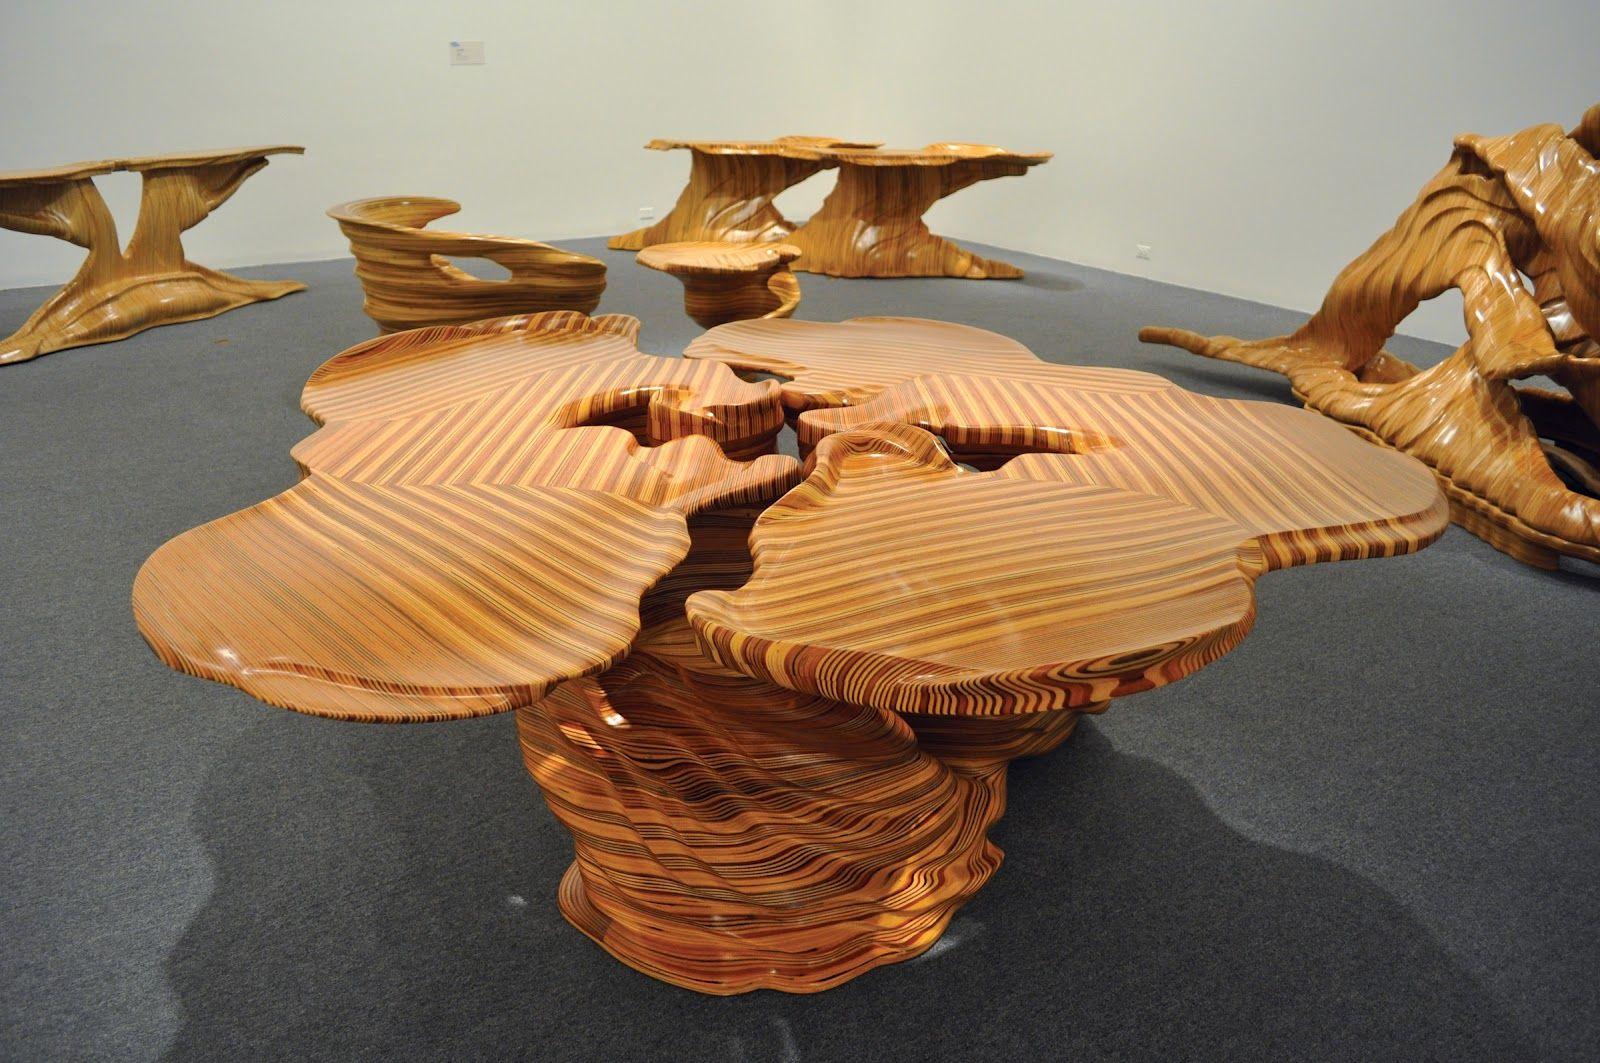 David knopp sculpture in 2020 sculptures artist